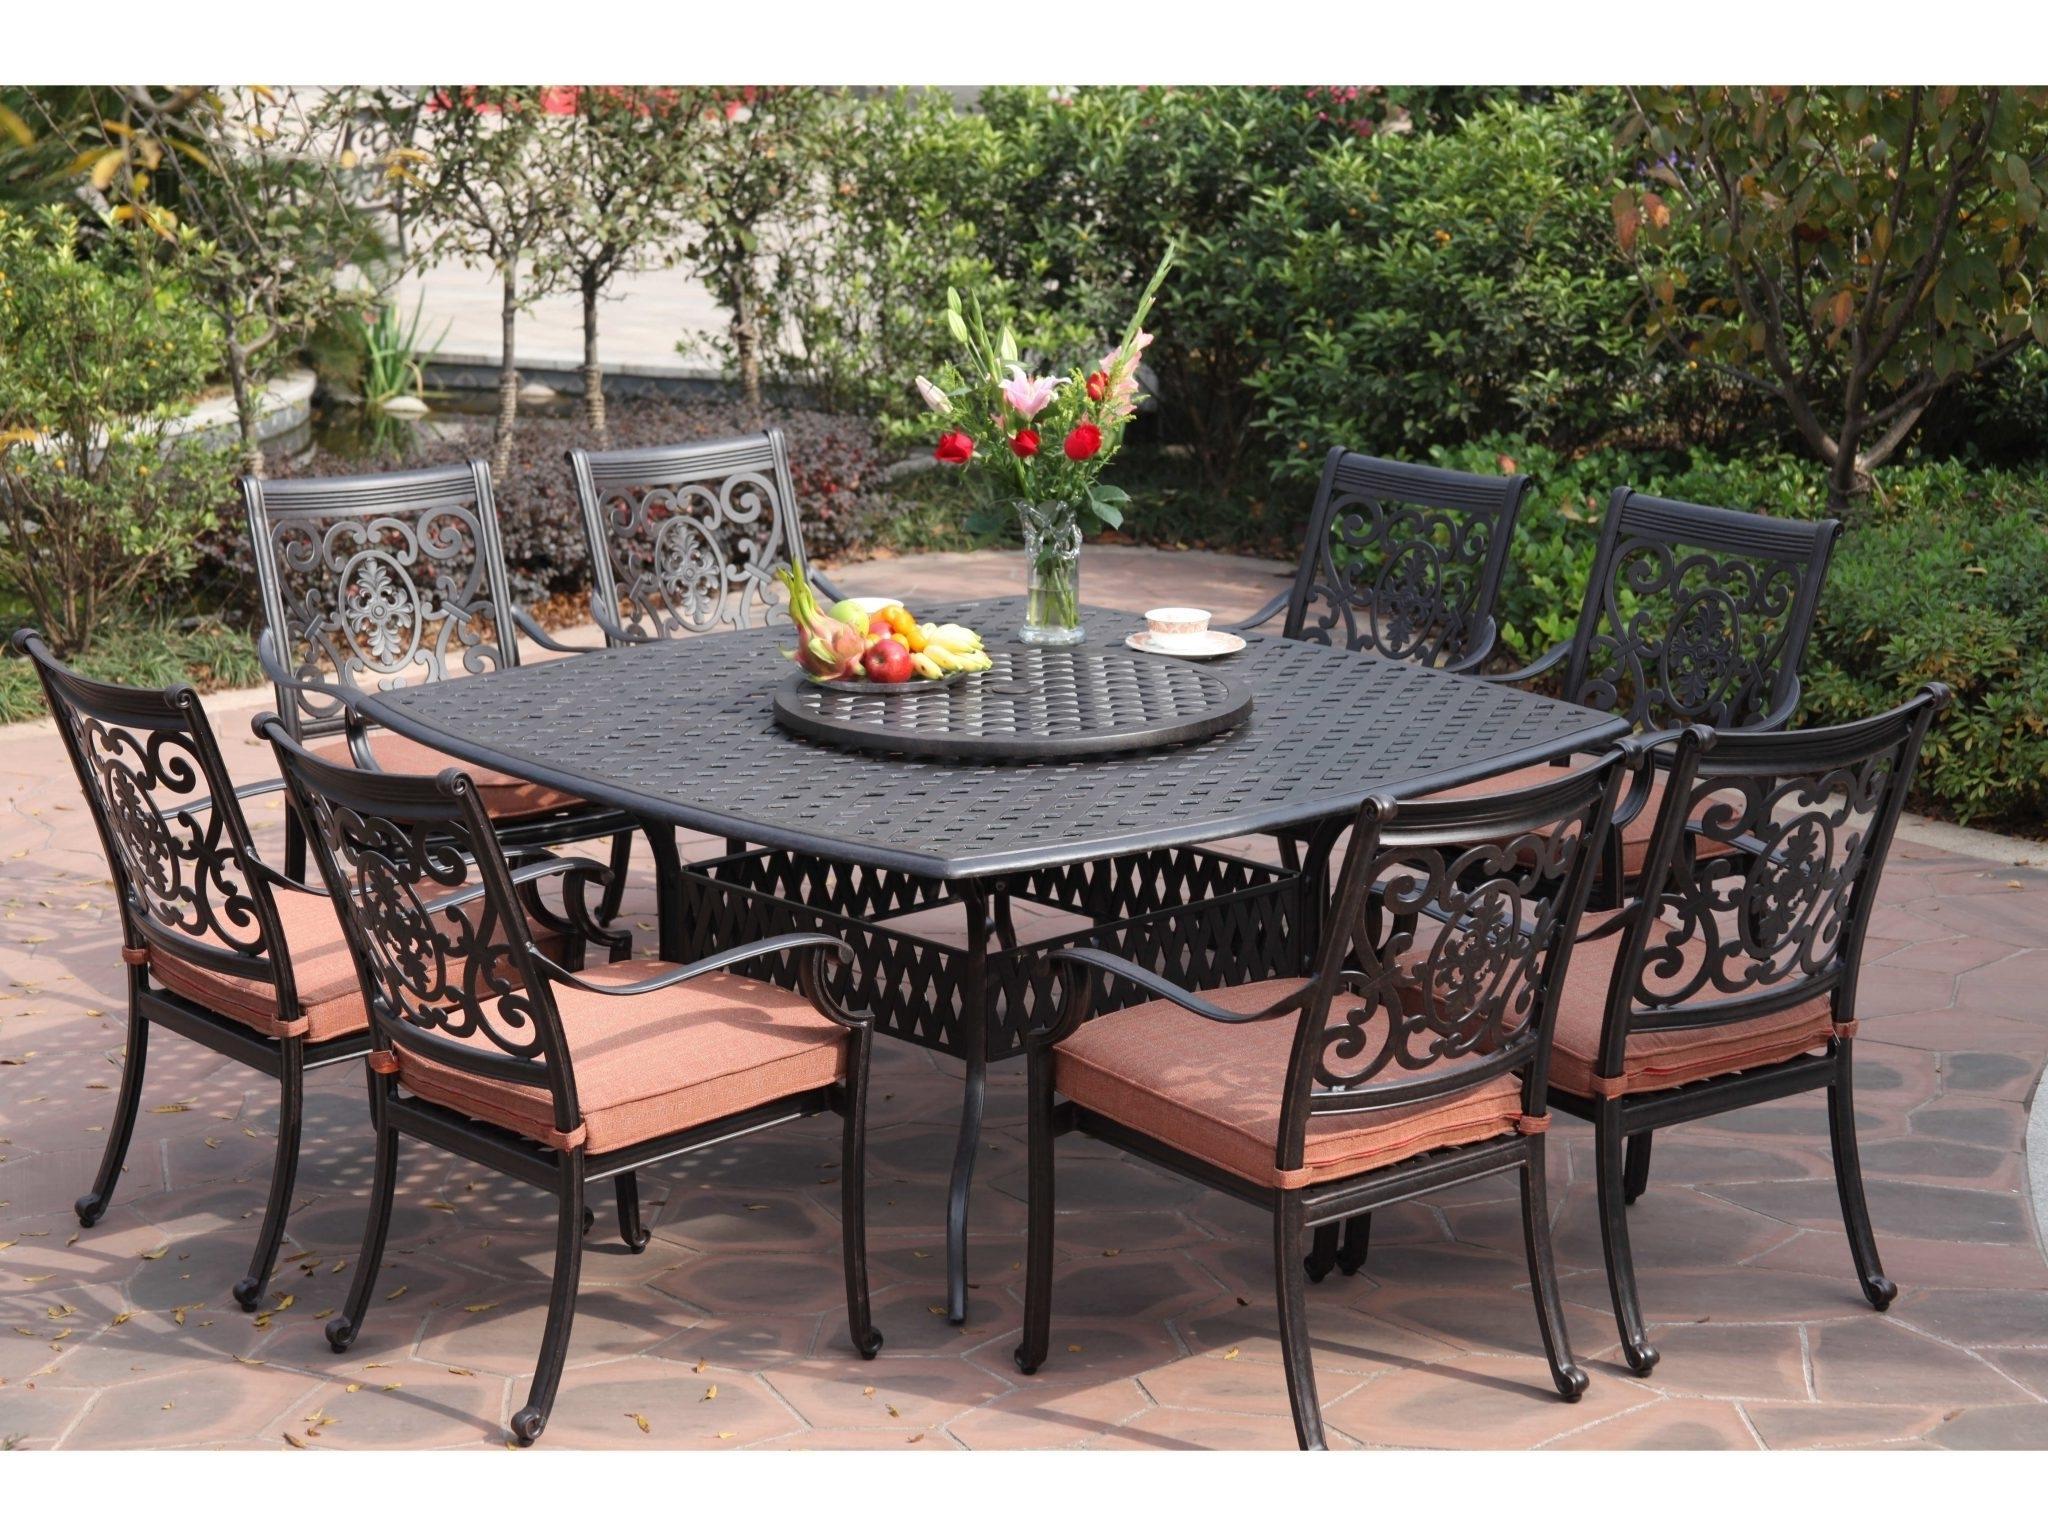 Most Recent Attractive Patio Furniture Costco Online 22 Wonderful Chairs Up Regarding Kirkland Patio Umbrellas (View 16 of 20)